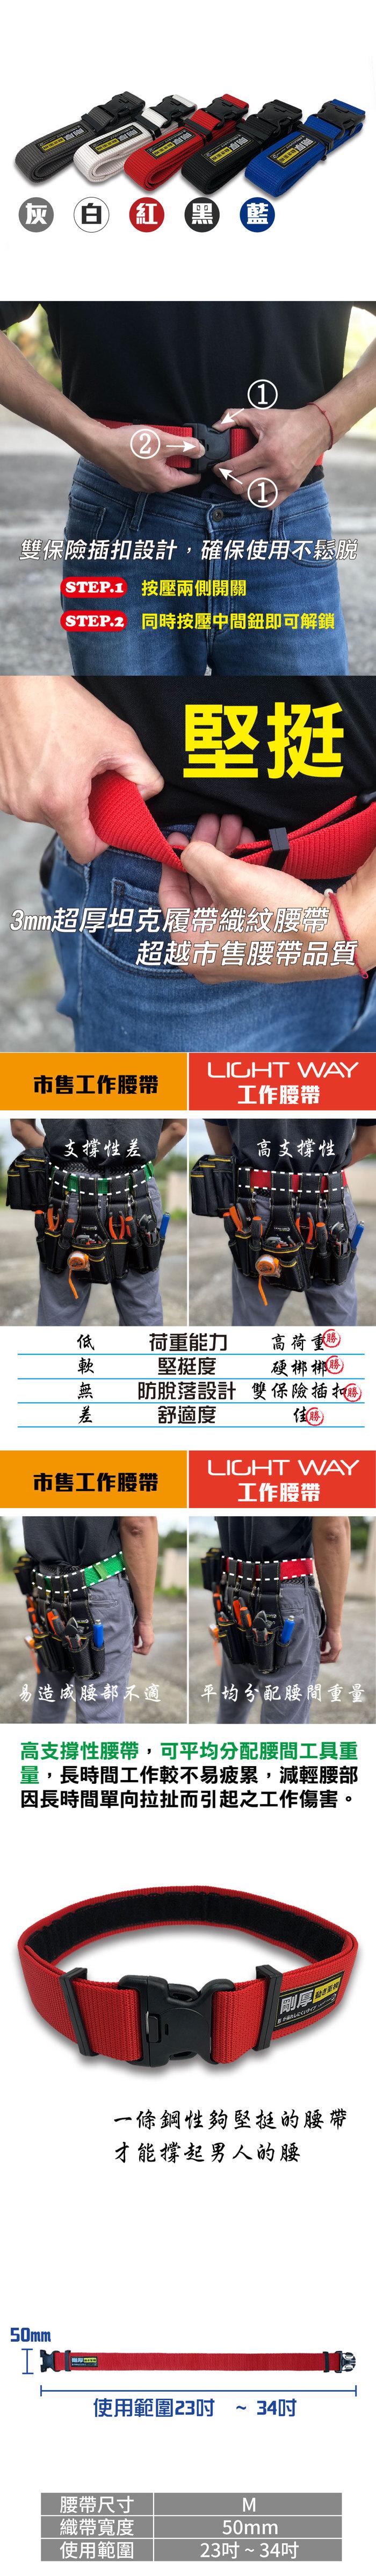 Light way|雙保險高鋼性工作腰帶(M)|23-34吋-藍